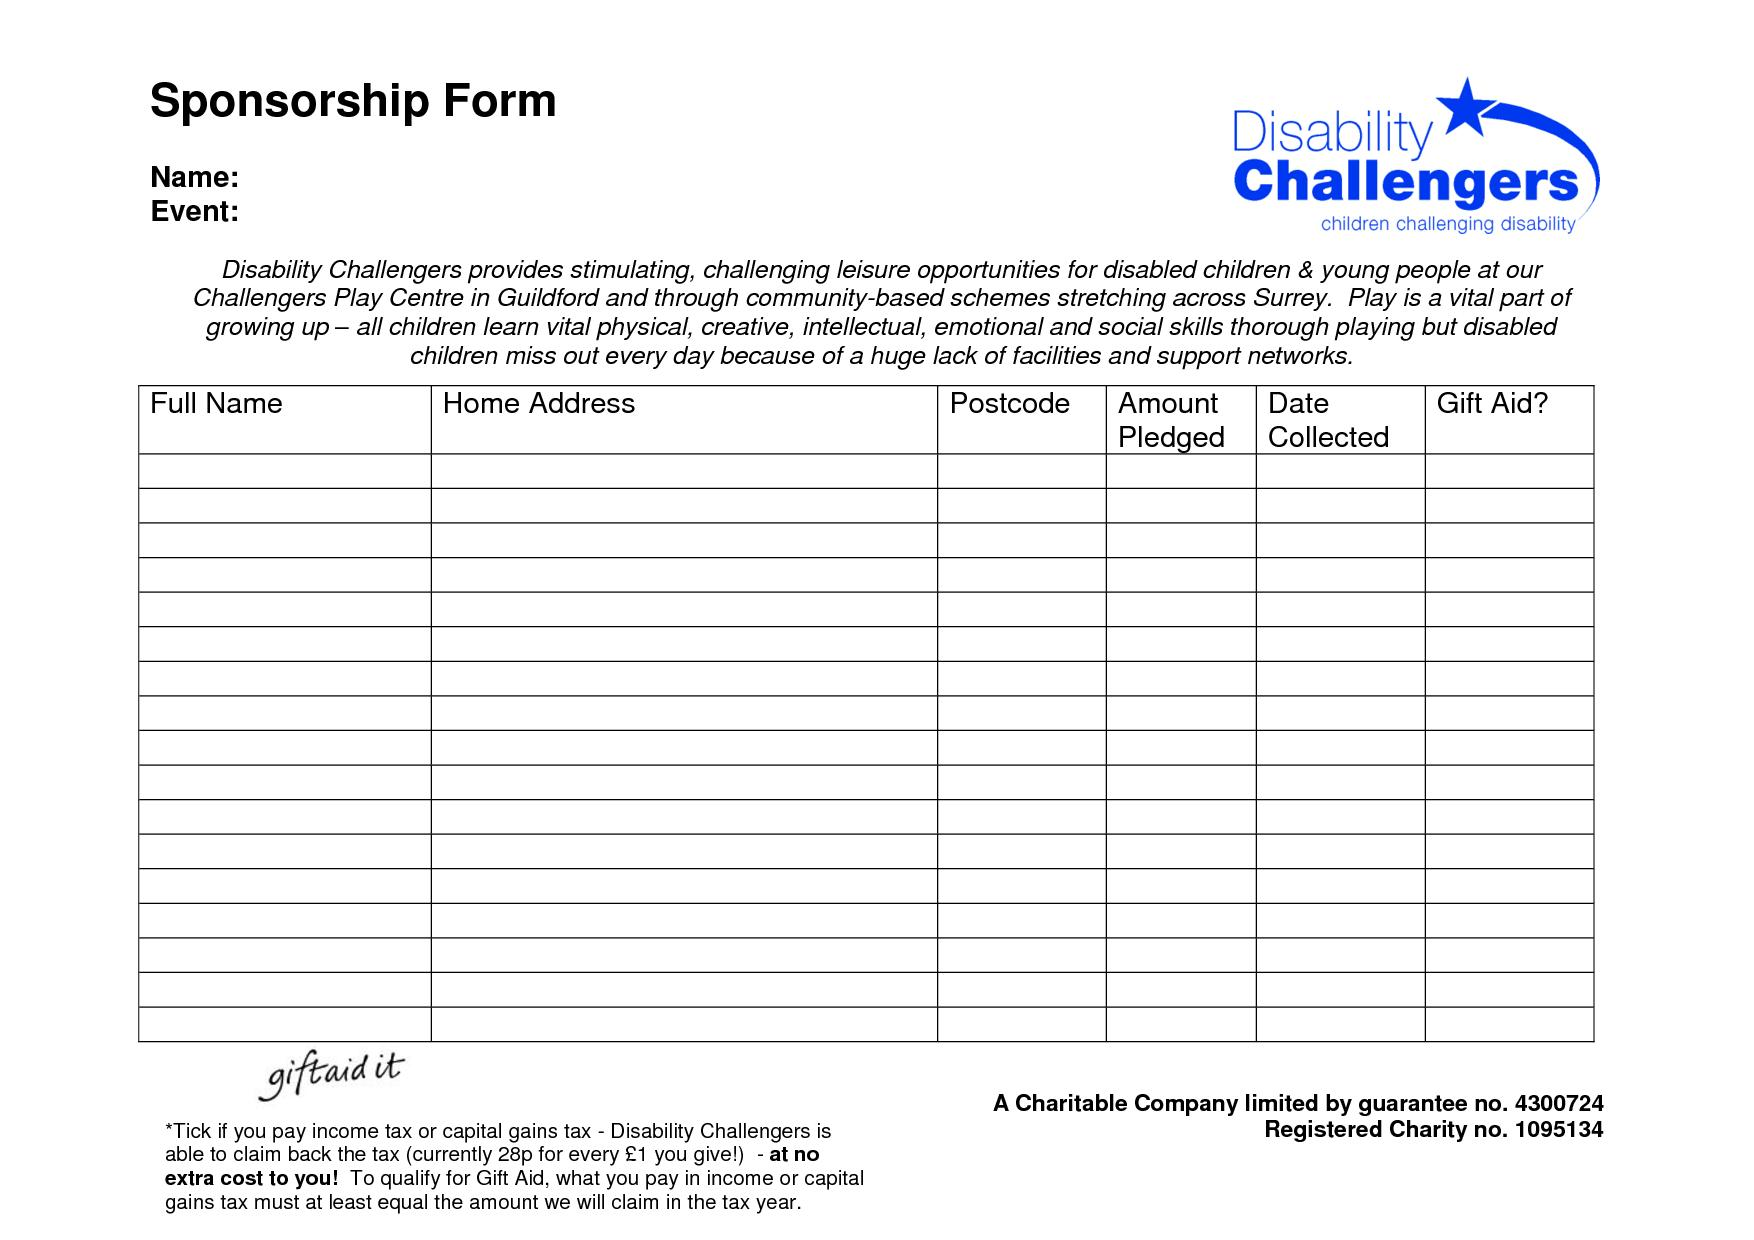 Fundraising Sponsorship Form Template